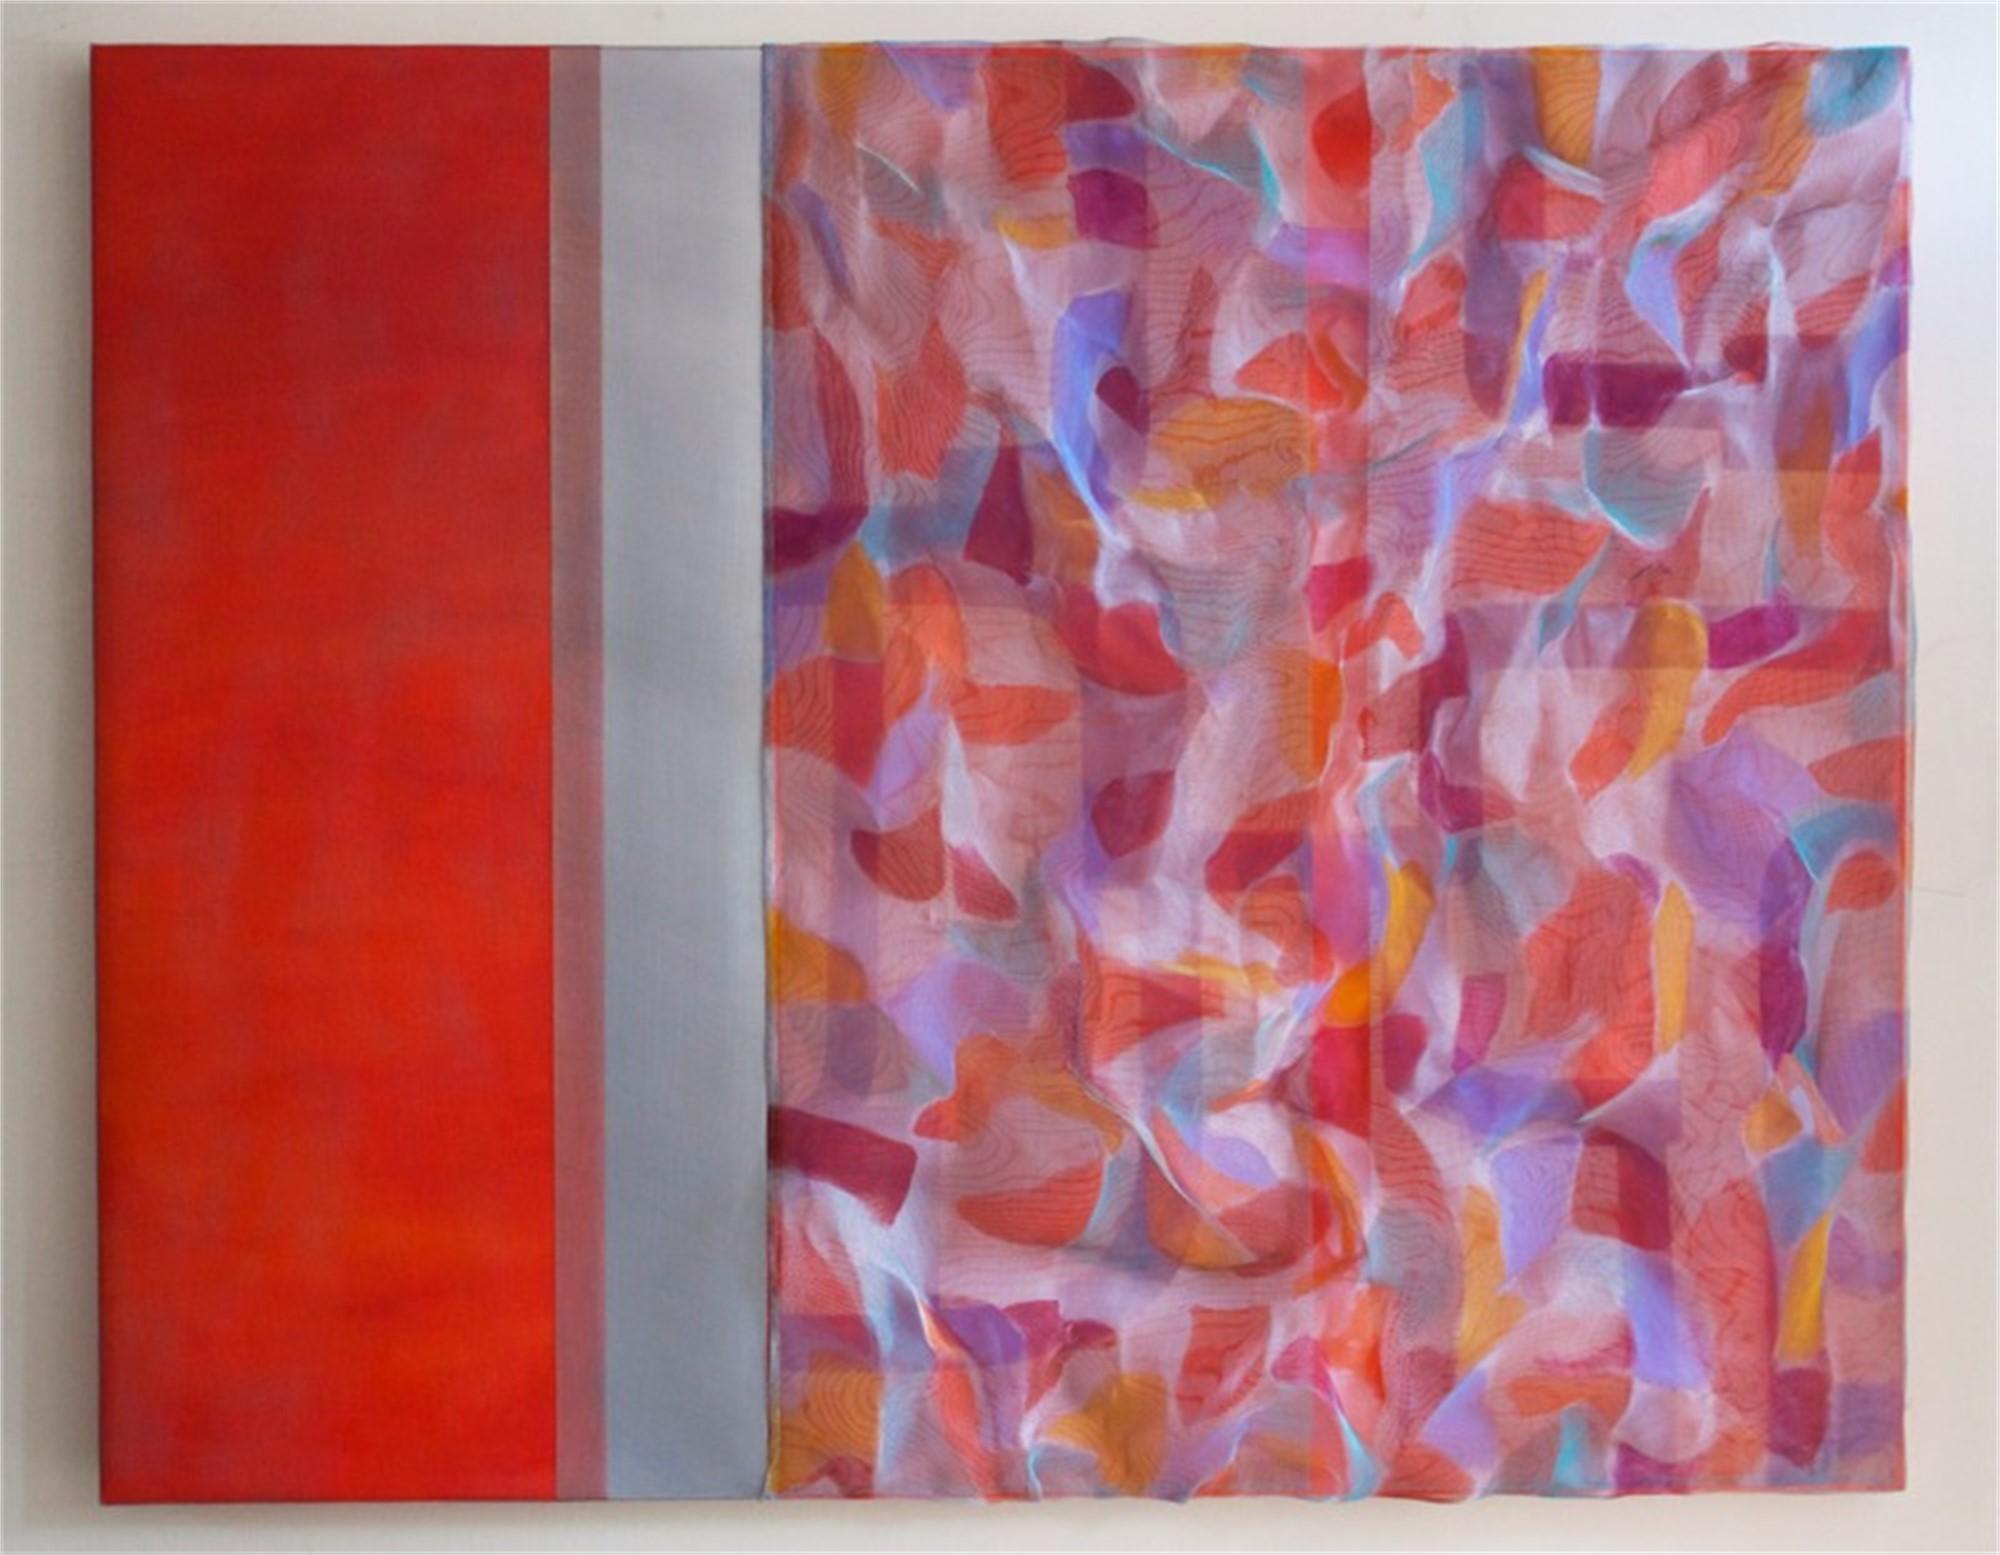 Lilia's Papaya by Joan Konkel